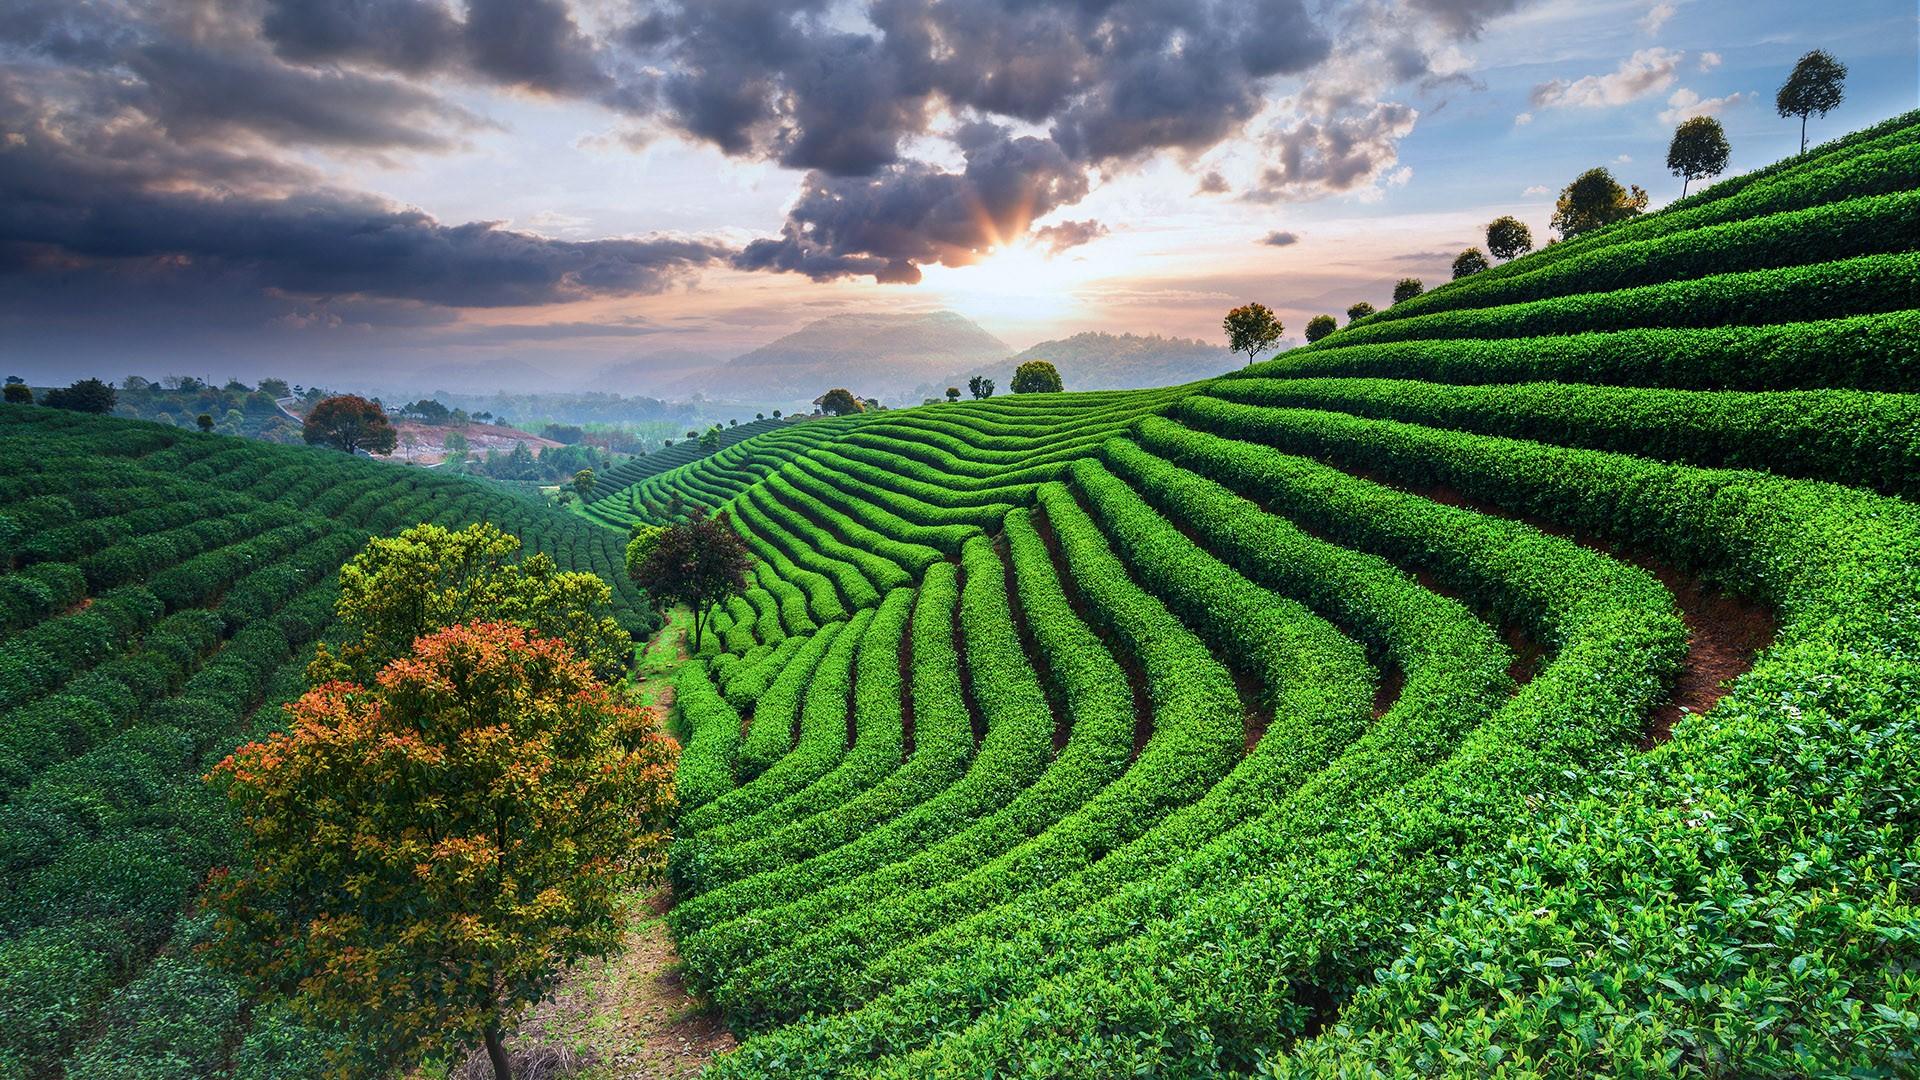 General 1920x1080 nature landscape trees field farm clouds sky mountains Sun sunset tea plant tea China